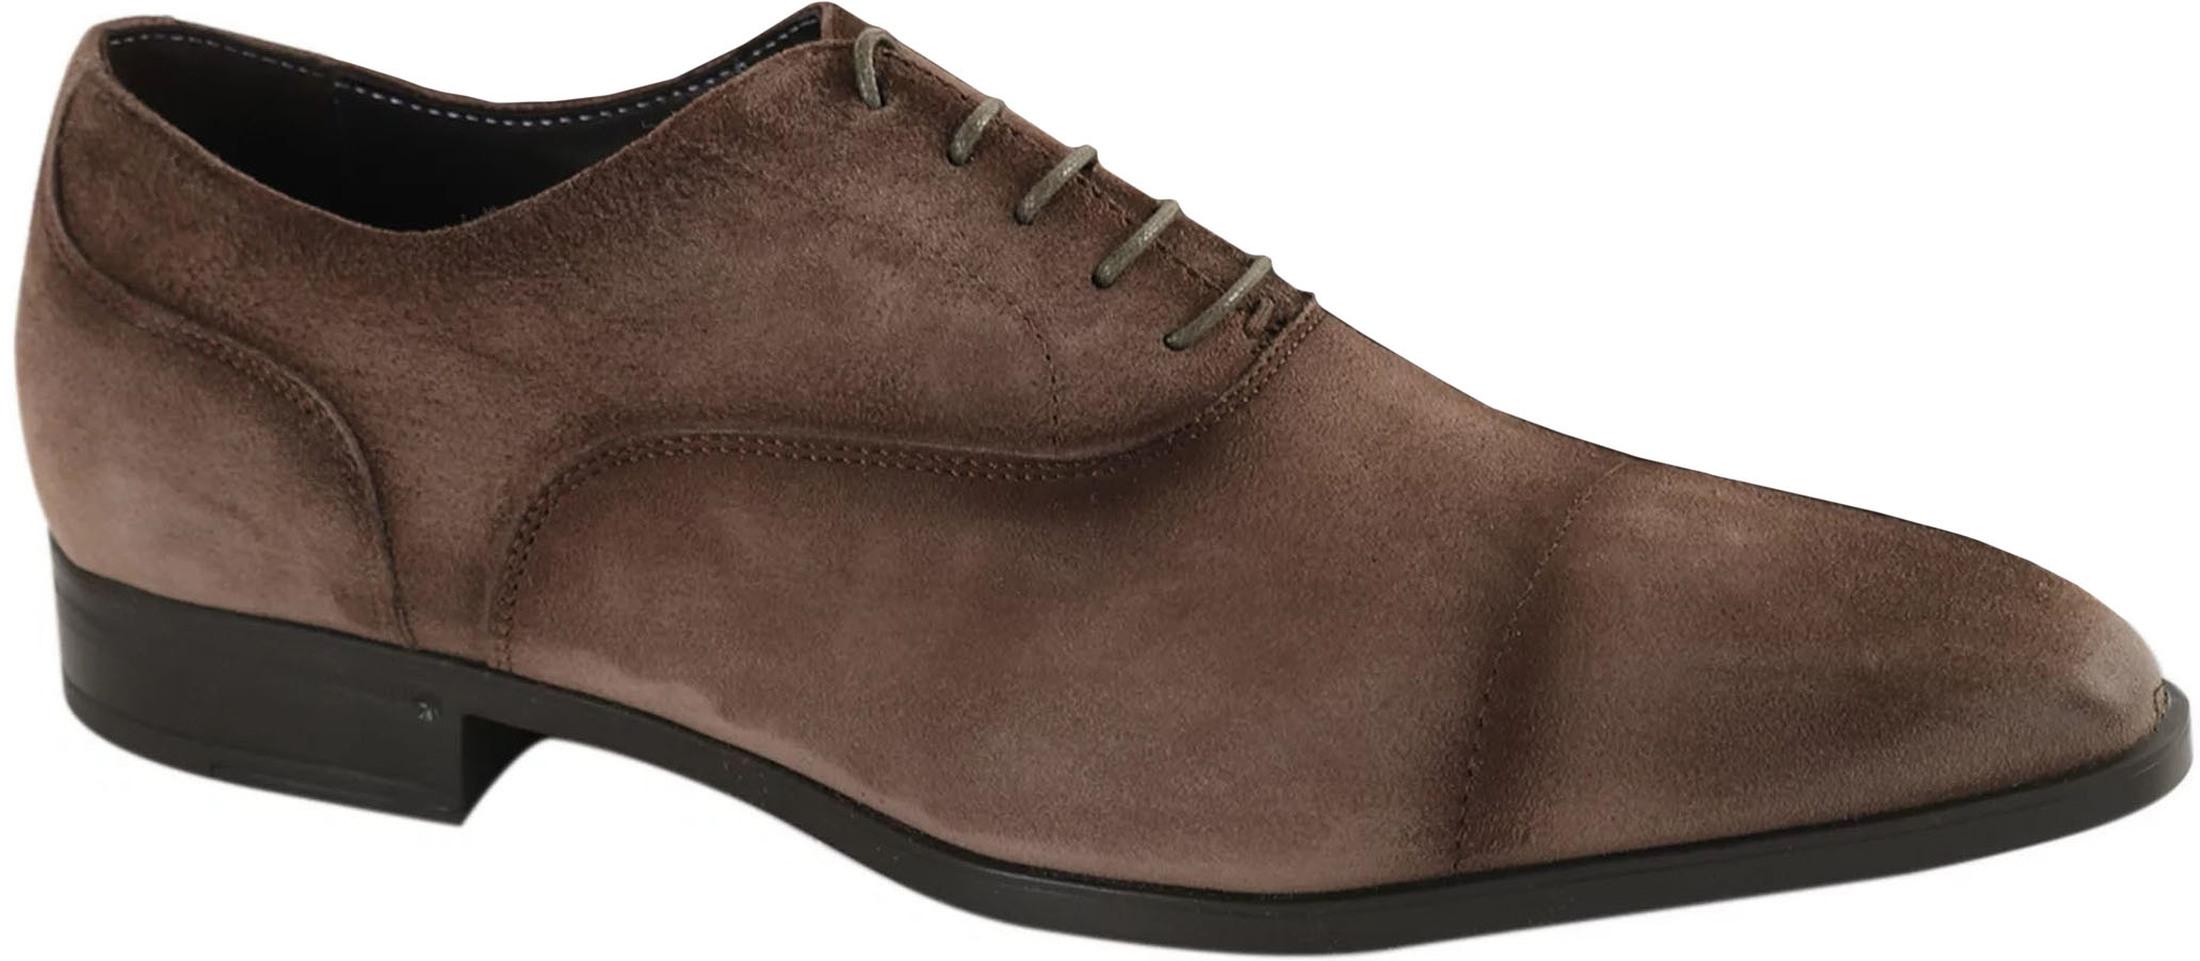 Giorgio Suede Shoes Brown foto 0